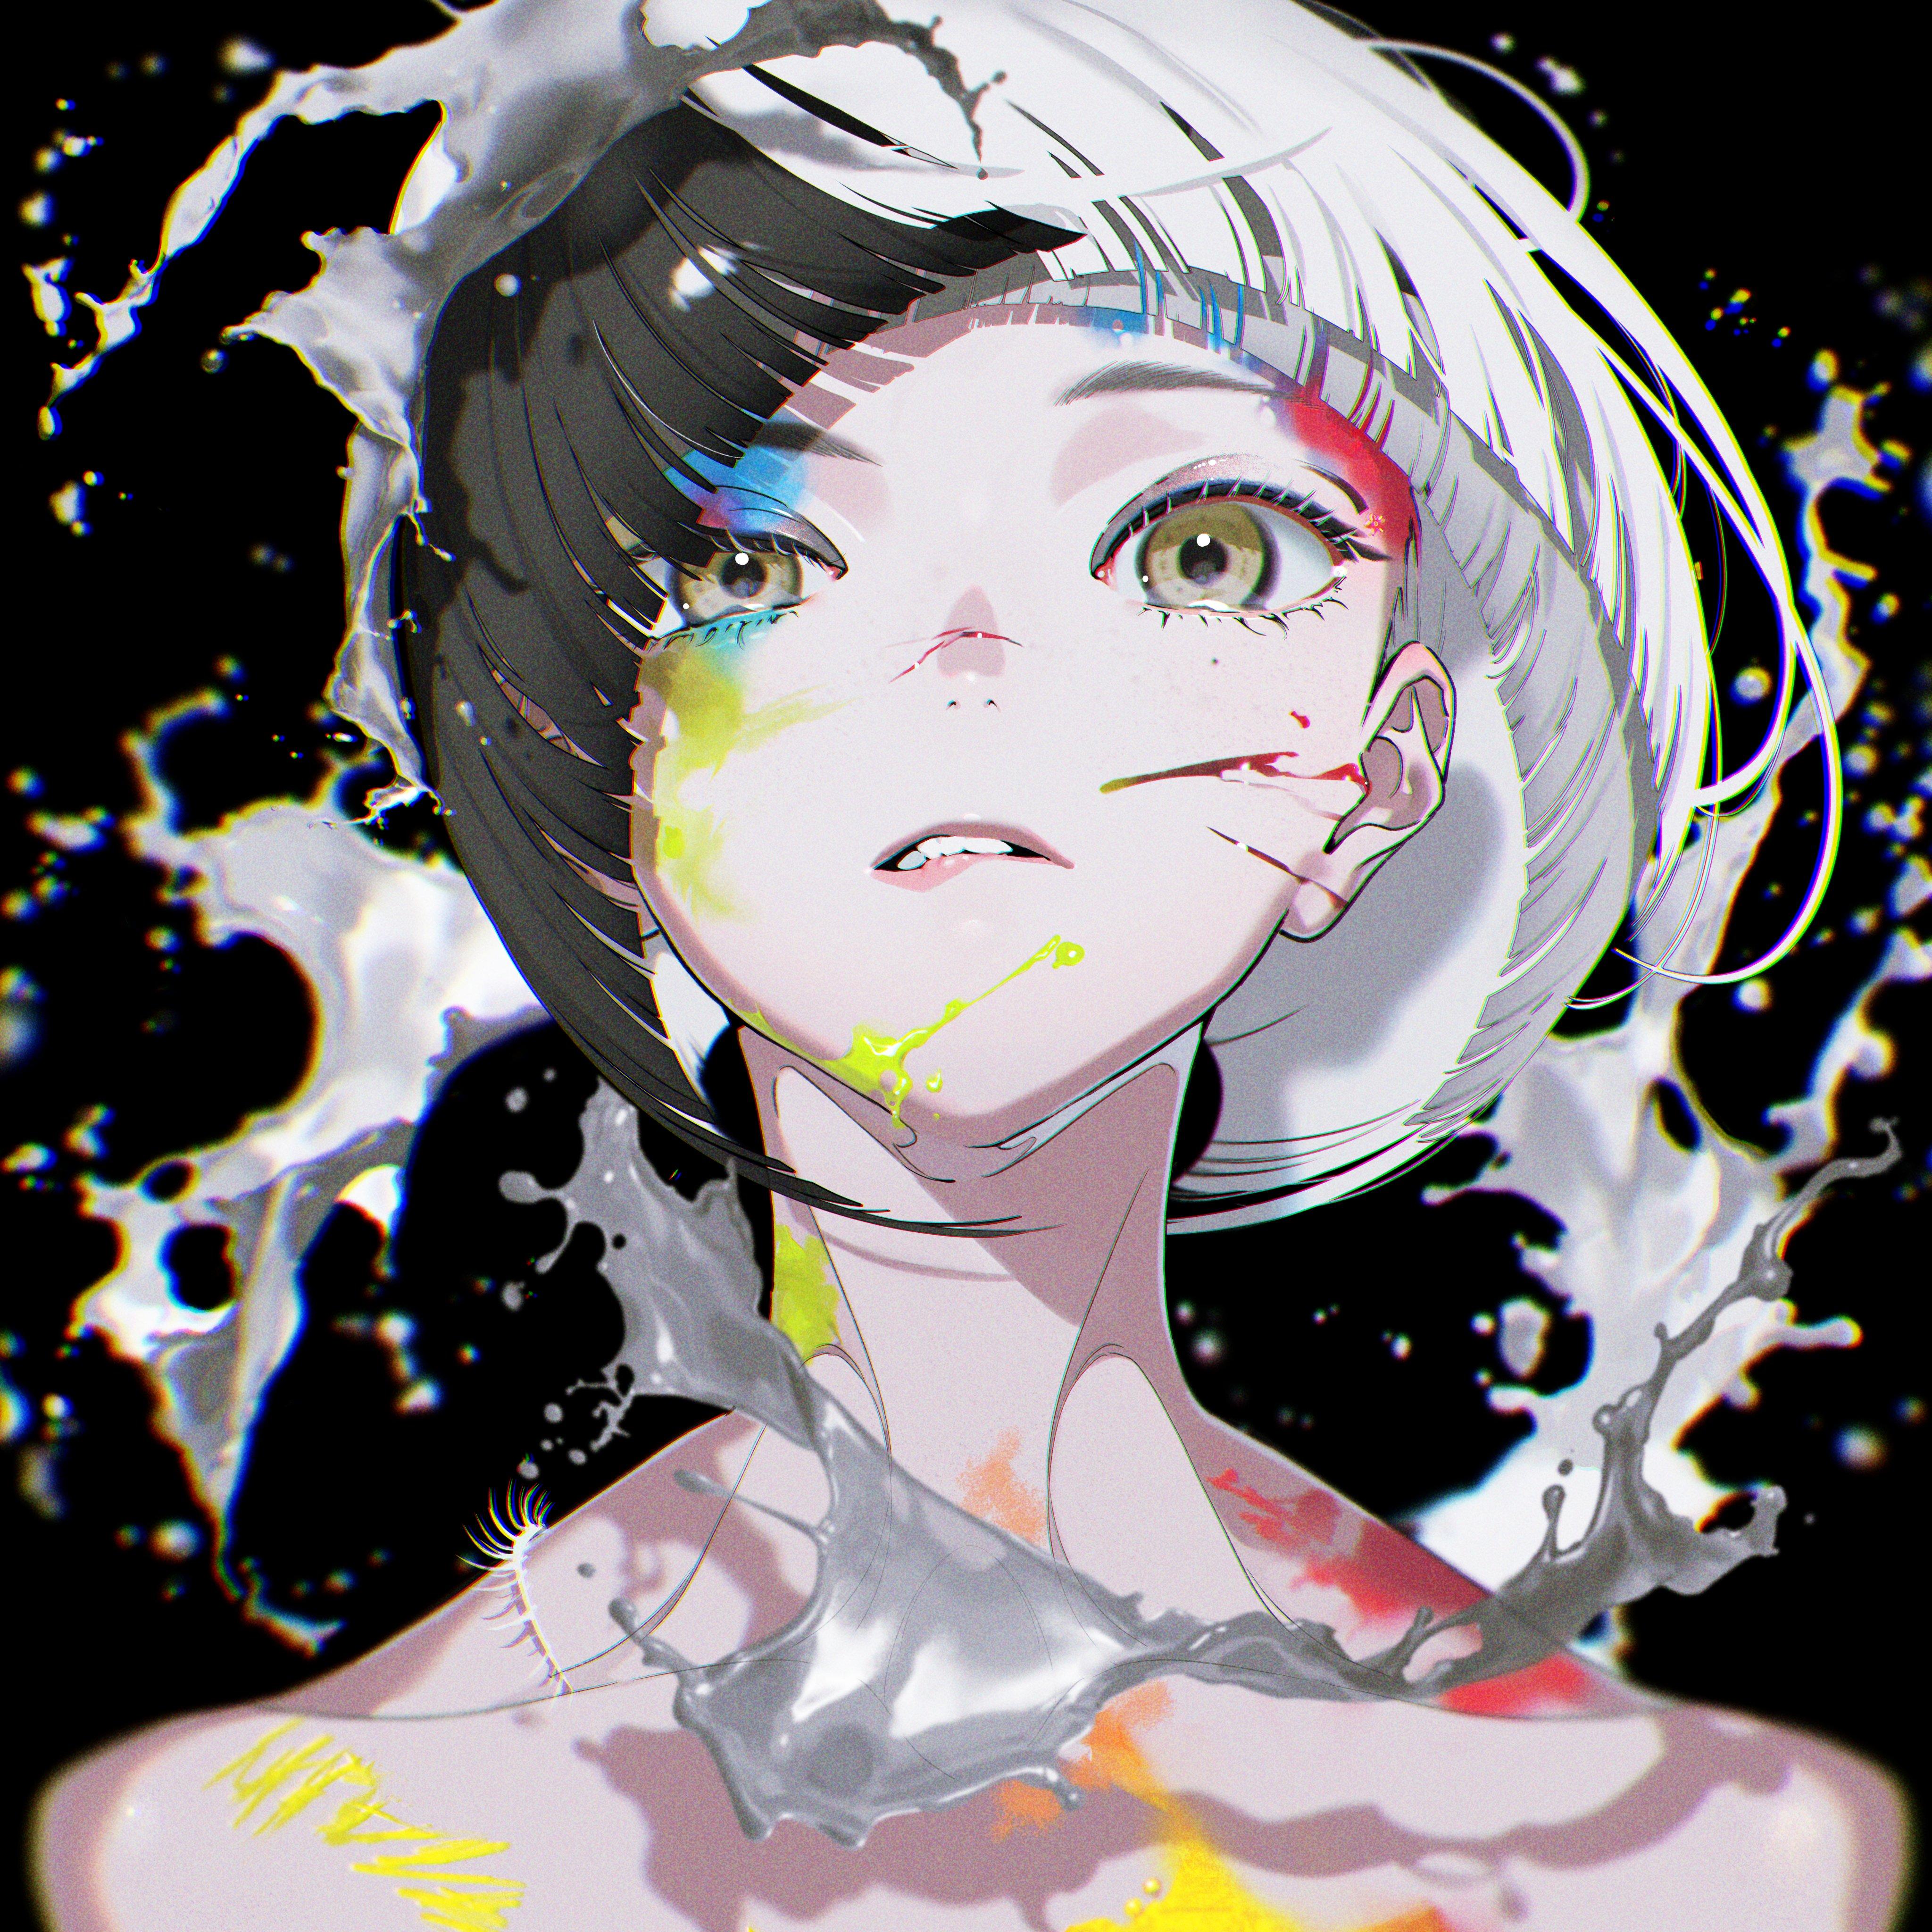 Anime 4096x4095 yoneyama mai grey hair black hair biting lip white hair two tone hair brown eyes multi-colored hair